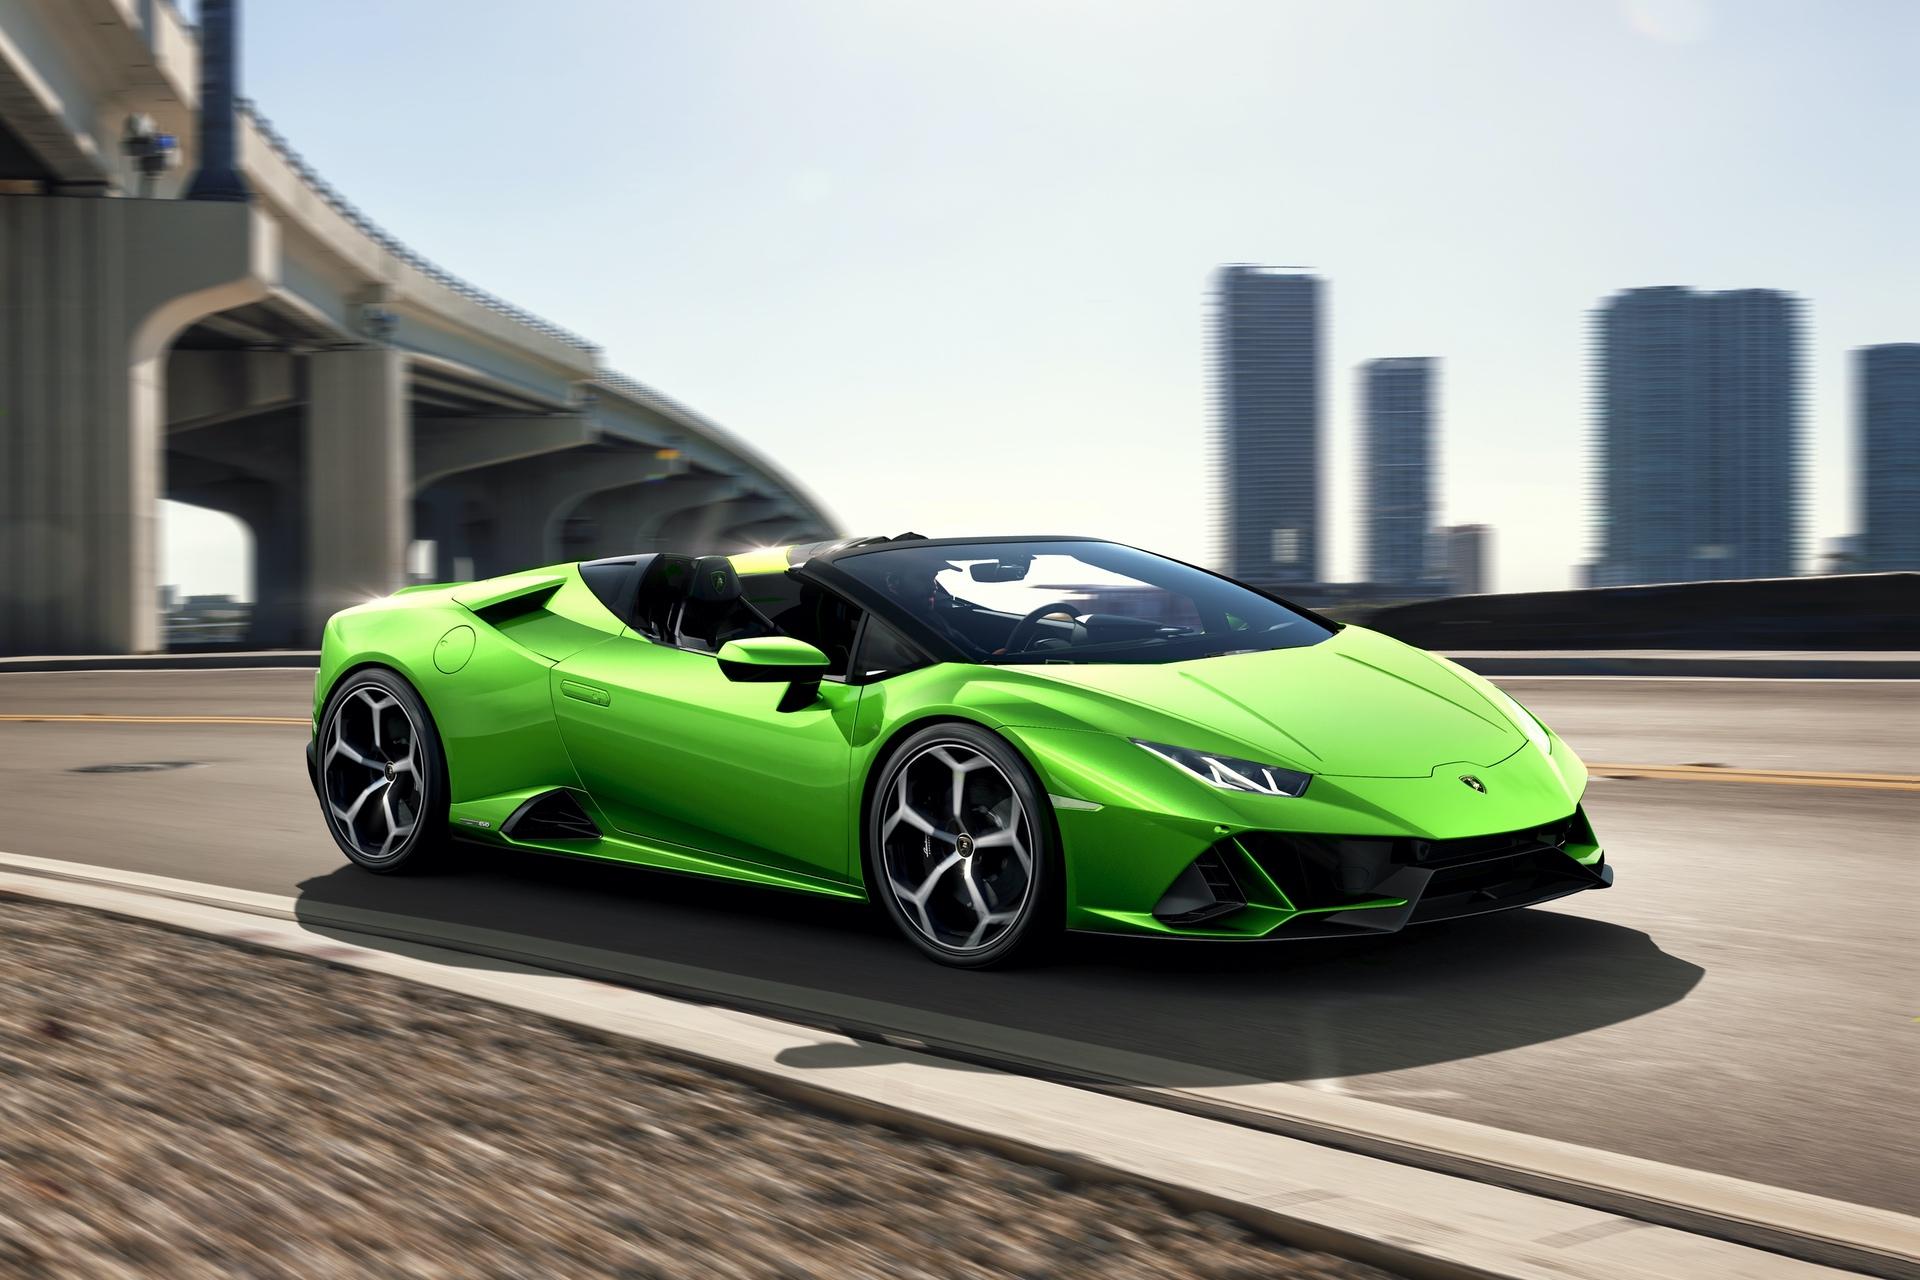 Lamborghini_Huracan_Evo_Spyder_0026